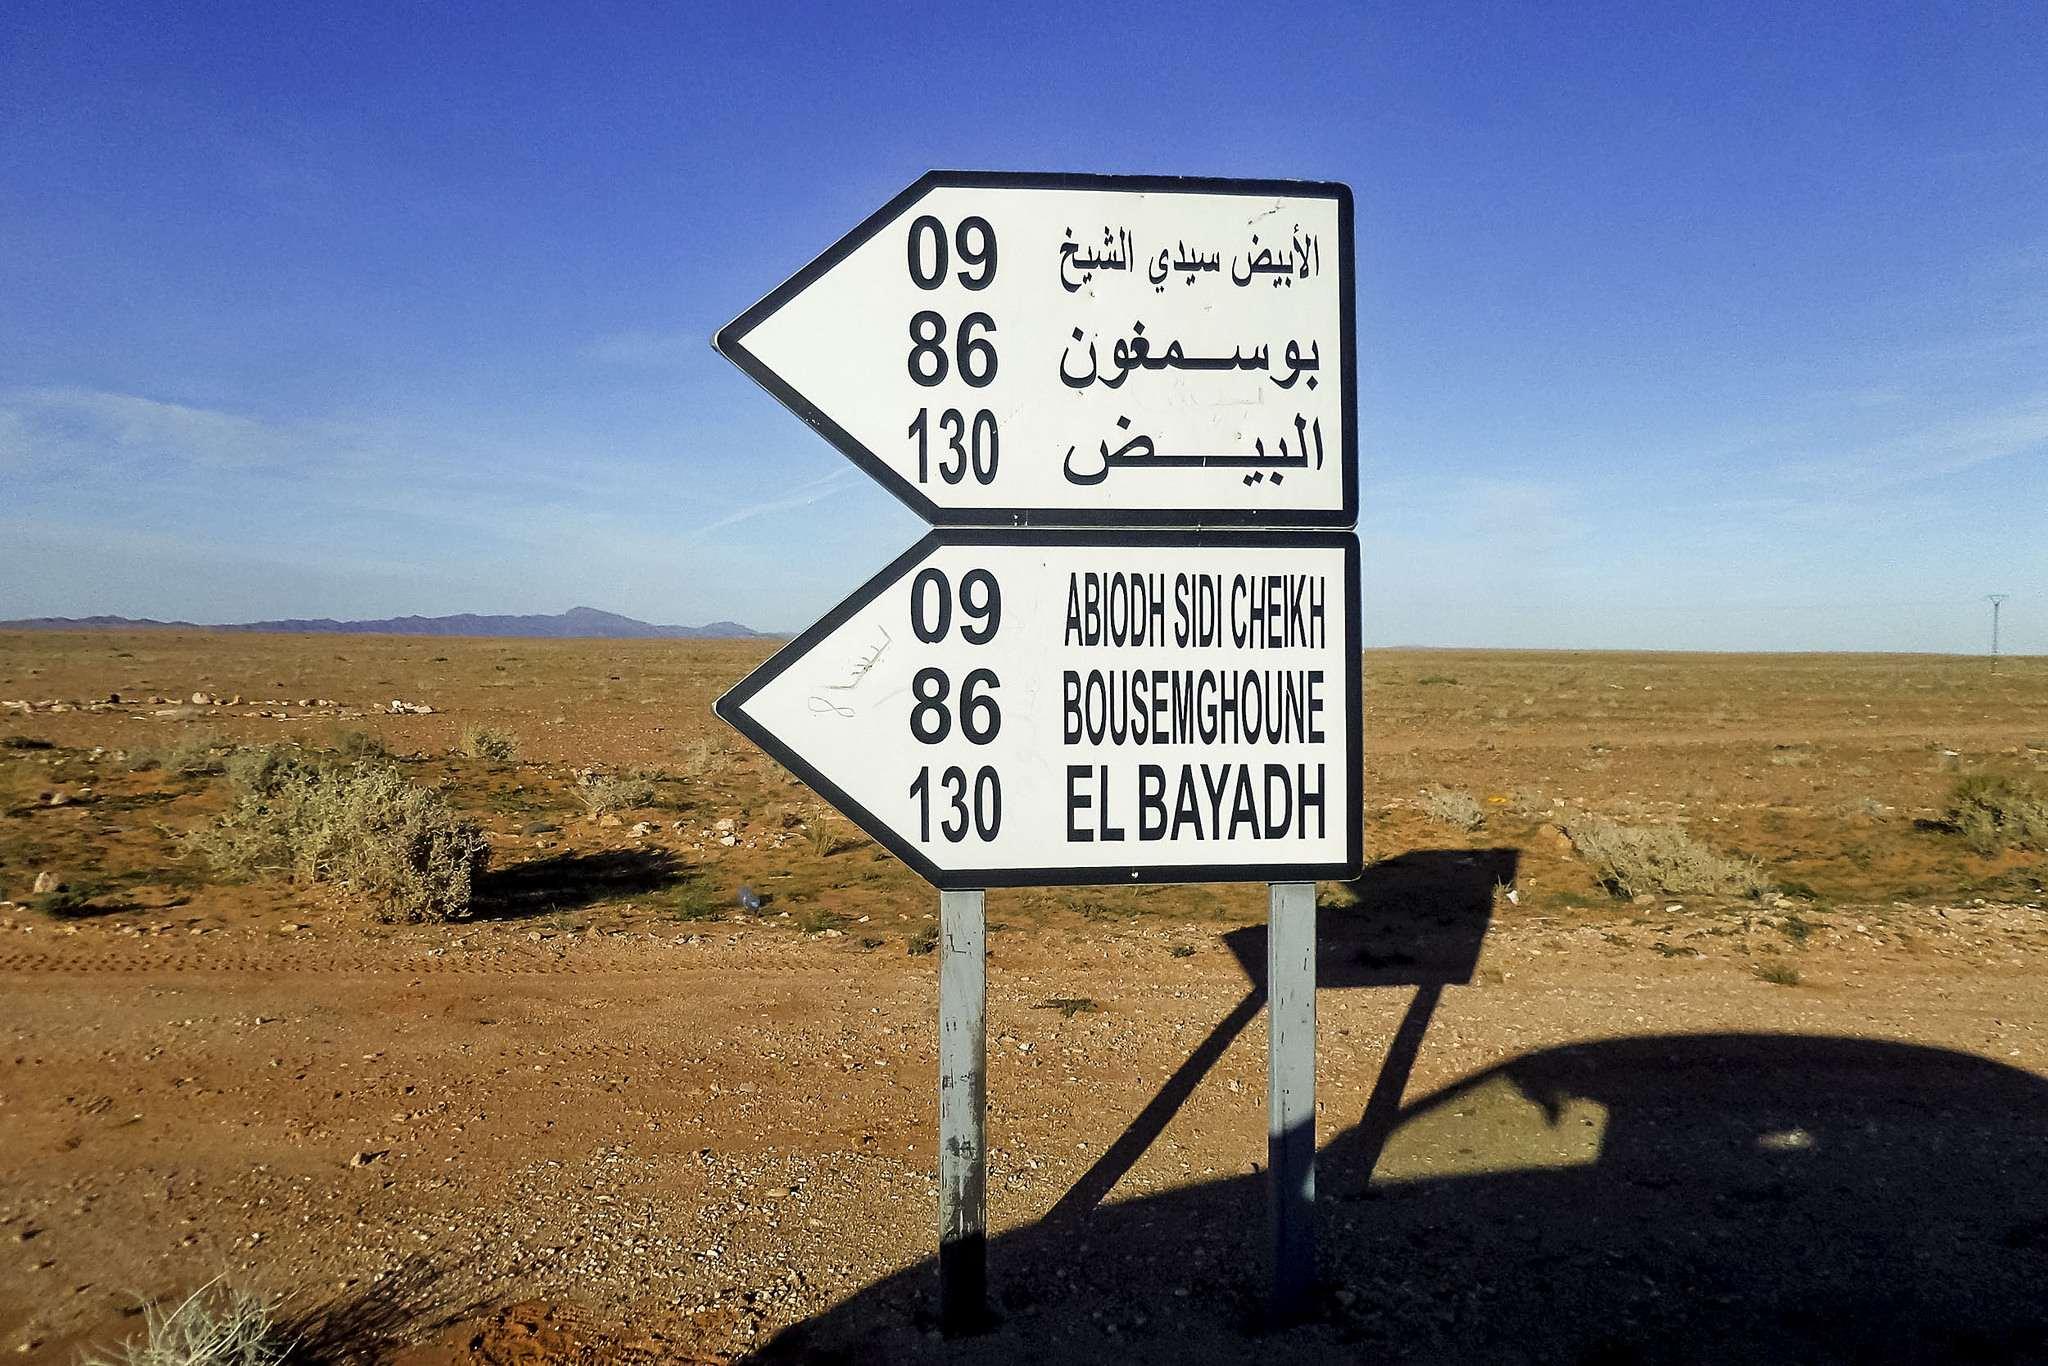 el bayadh El Bayadh Province in Algeria